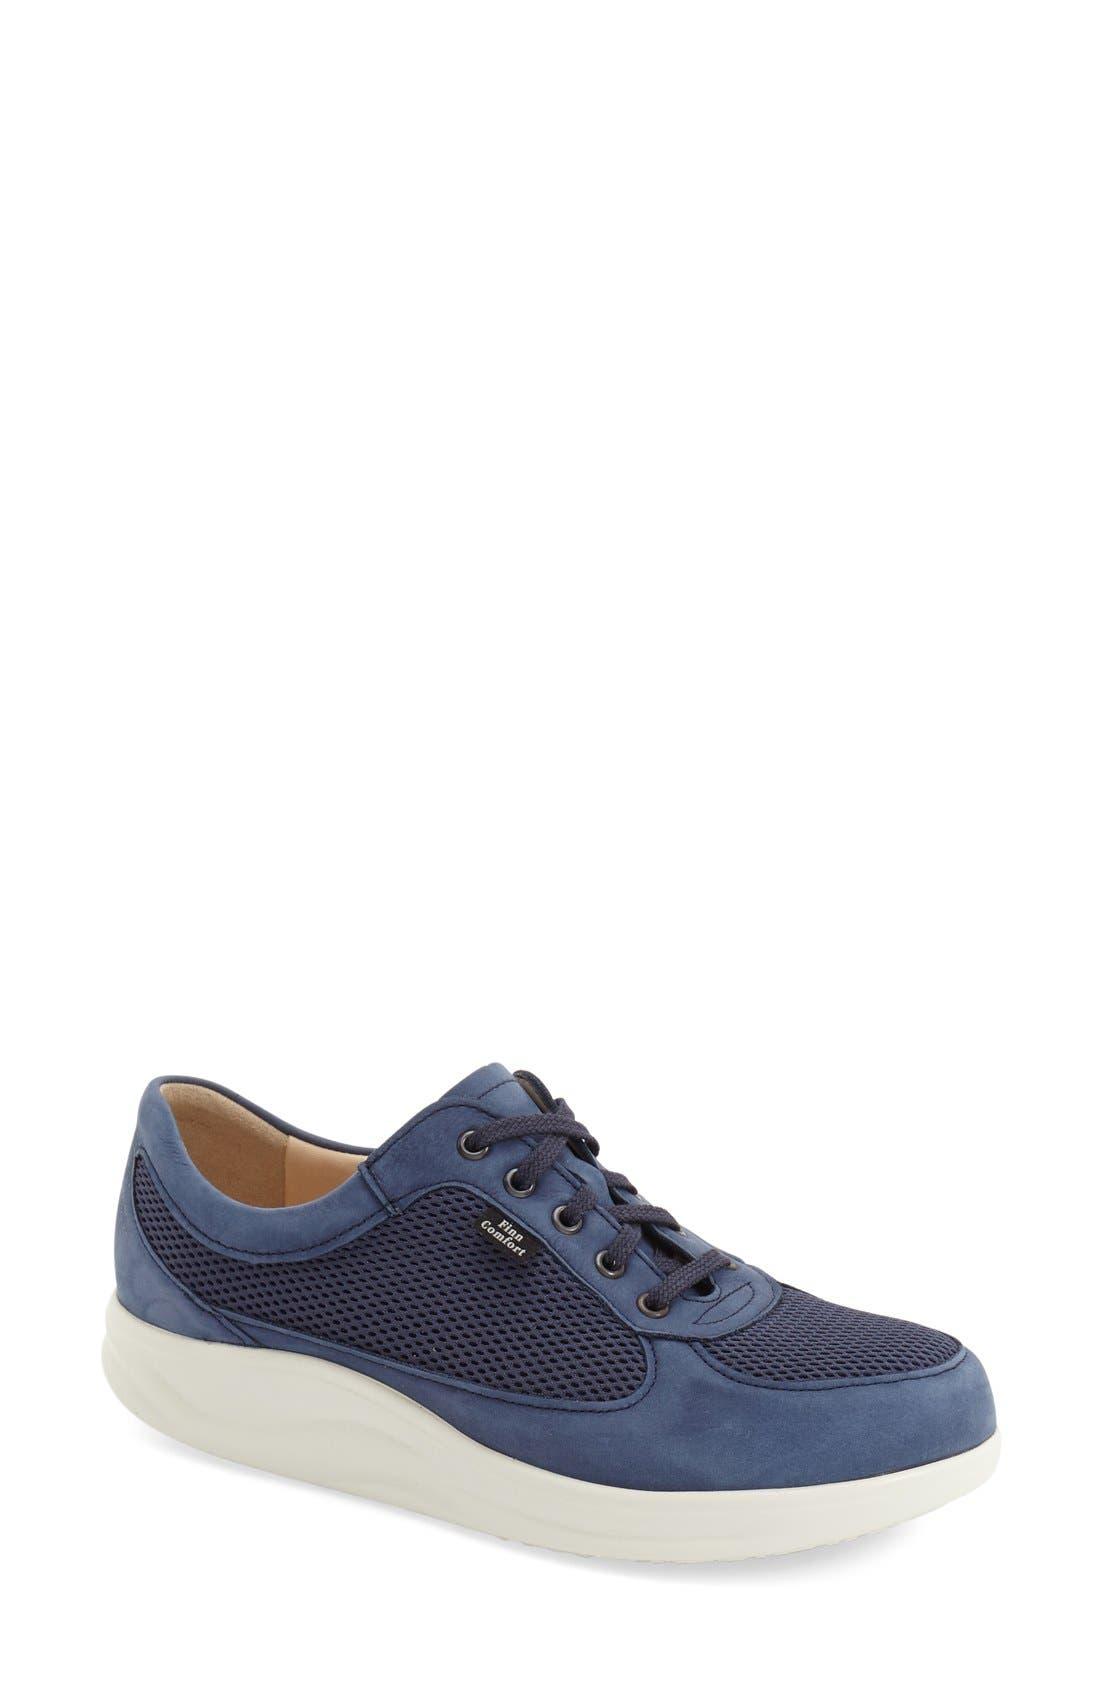 Alternate Image 1 Selected - Finn Comfort 'Columbia' Sneaker (Women)